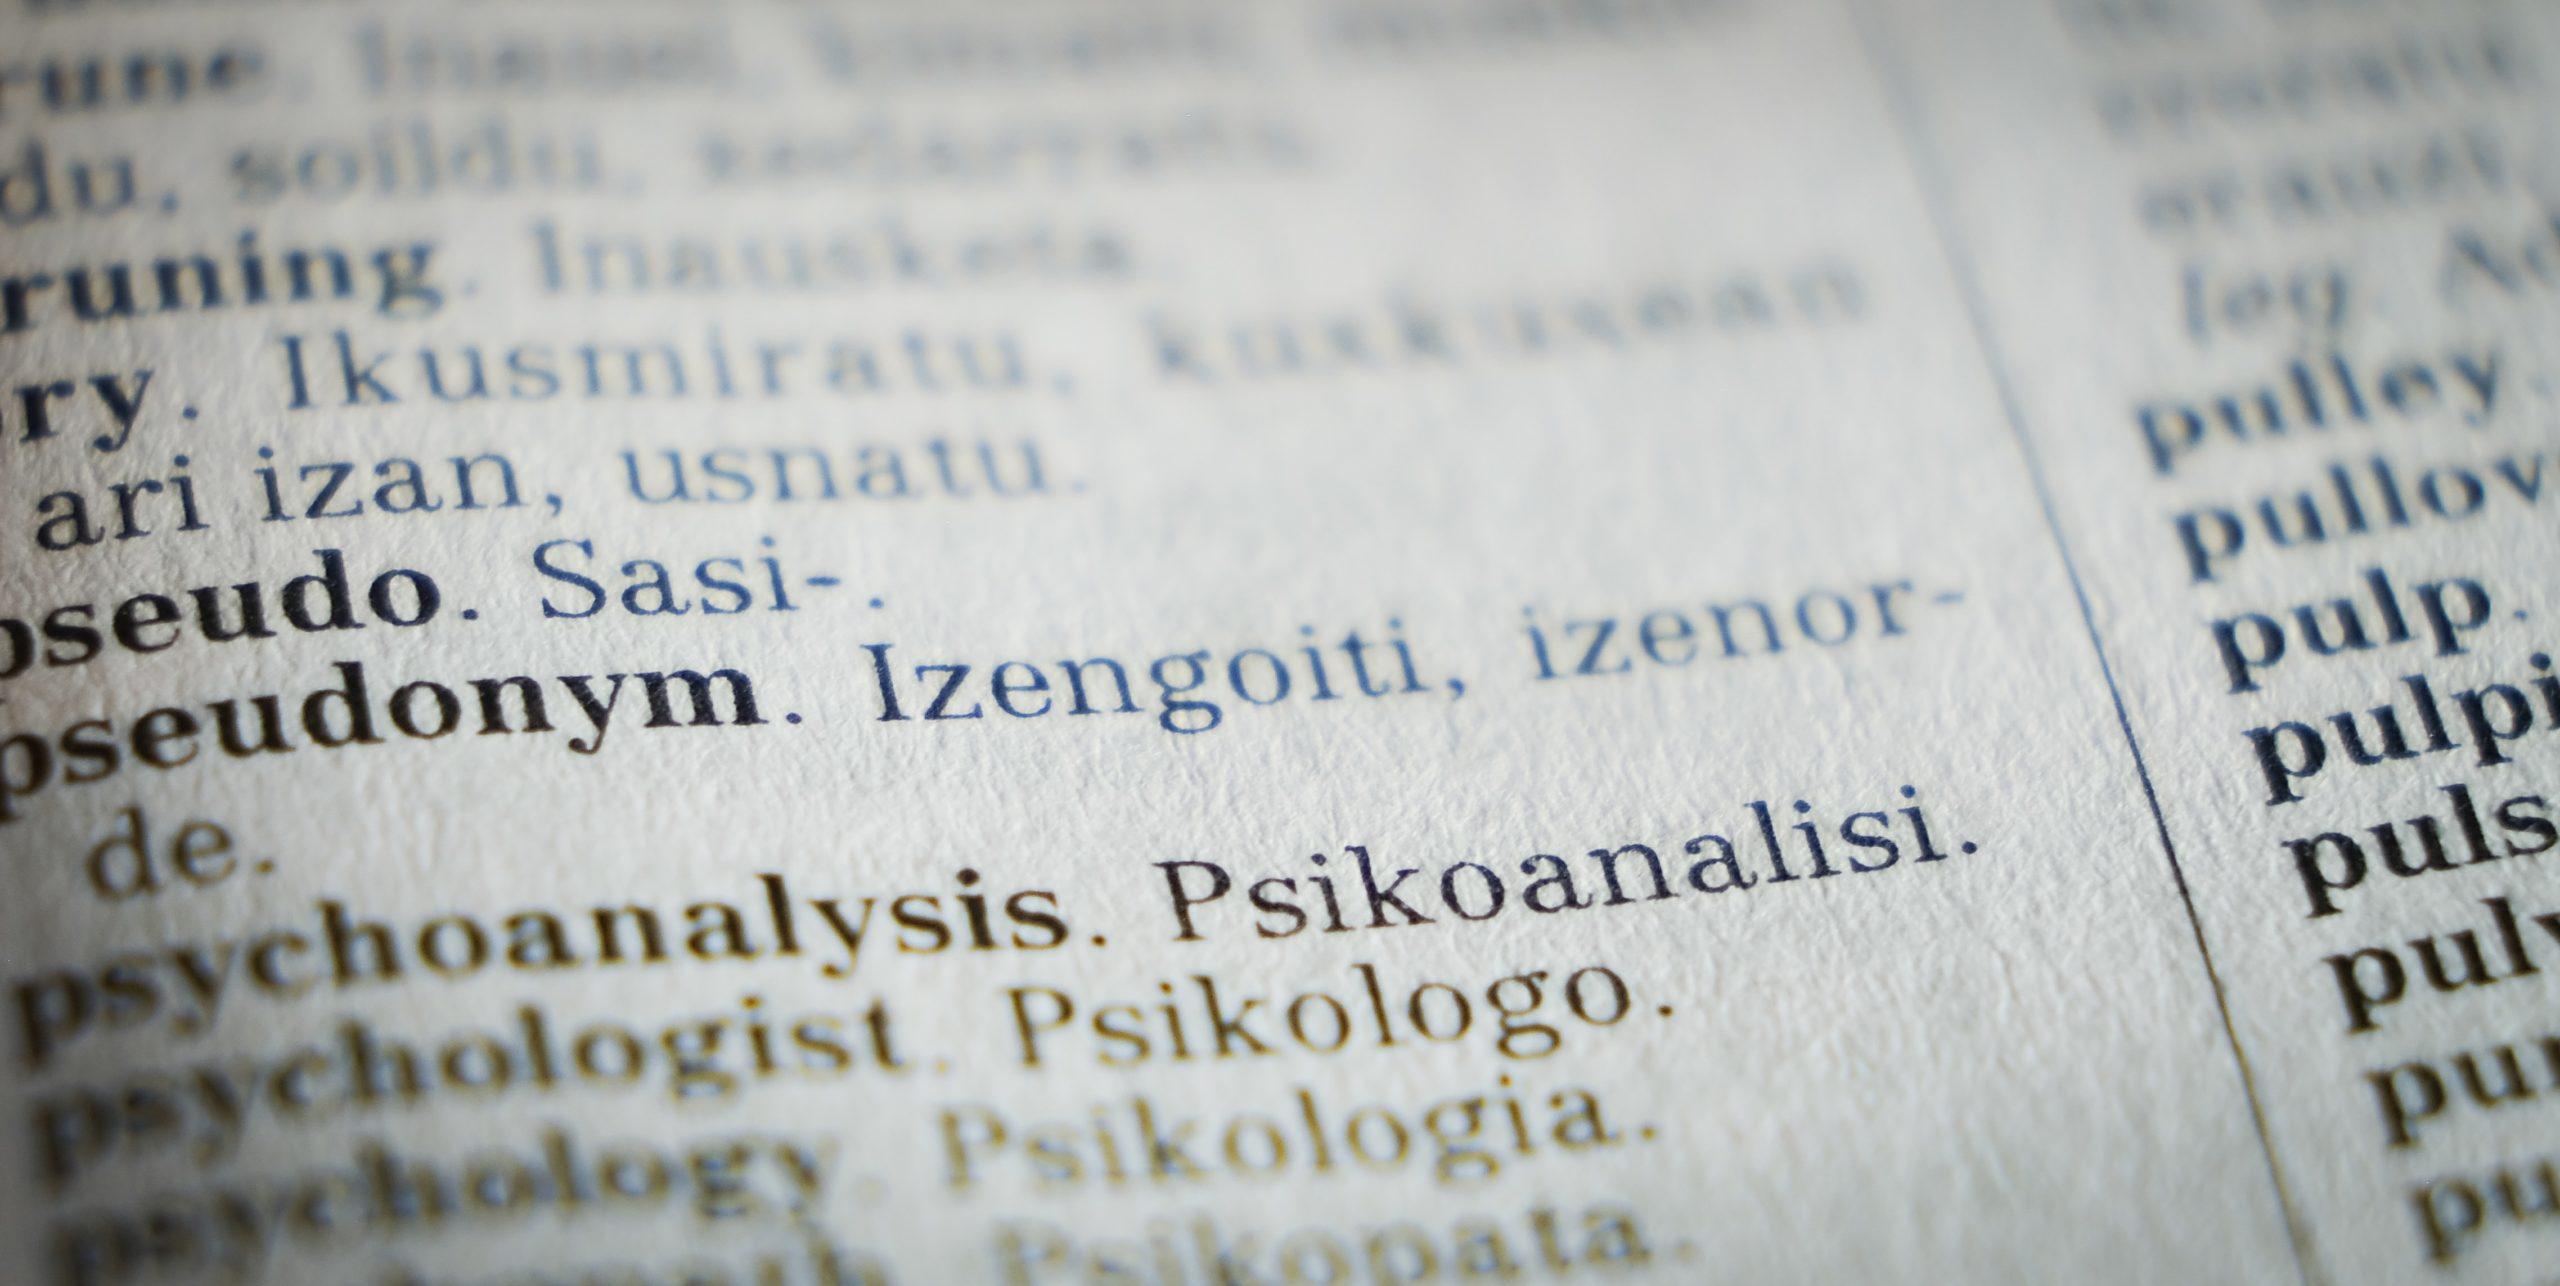 Global Events: Translation, Interpretation & Captioning